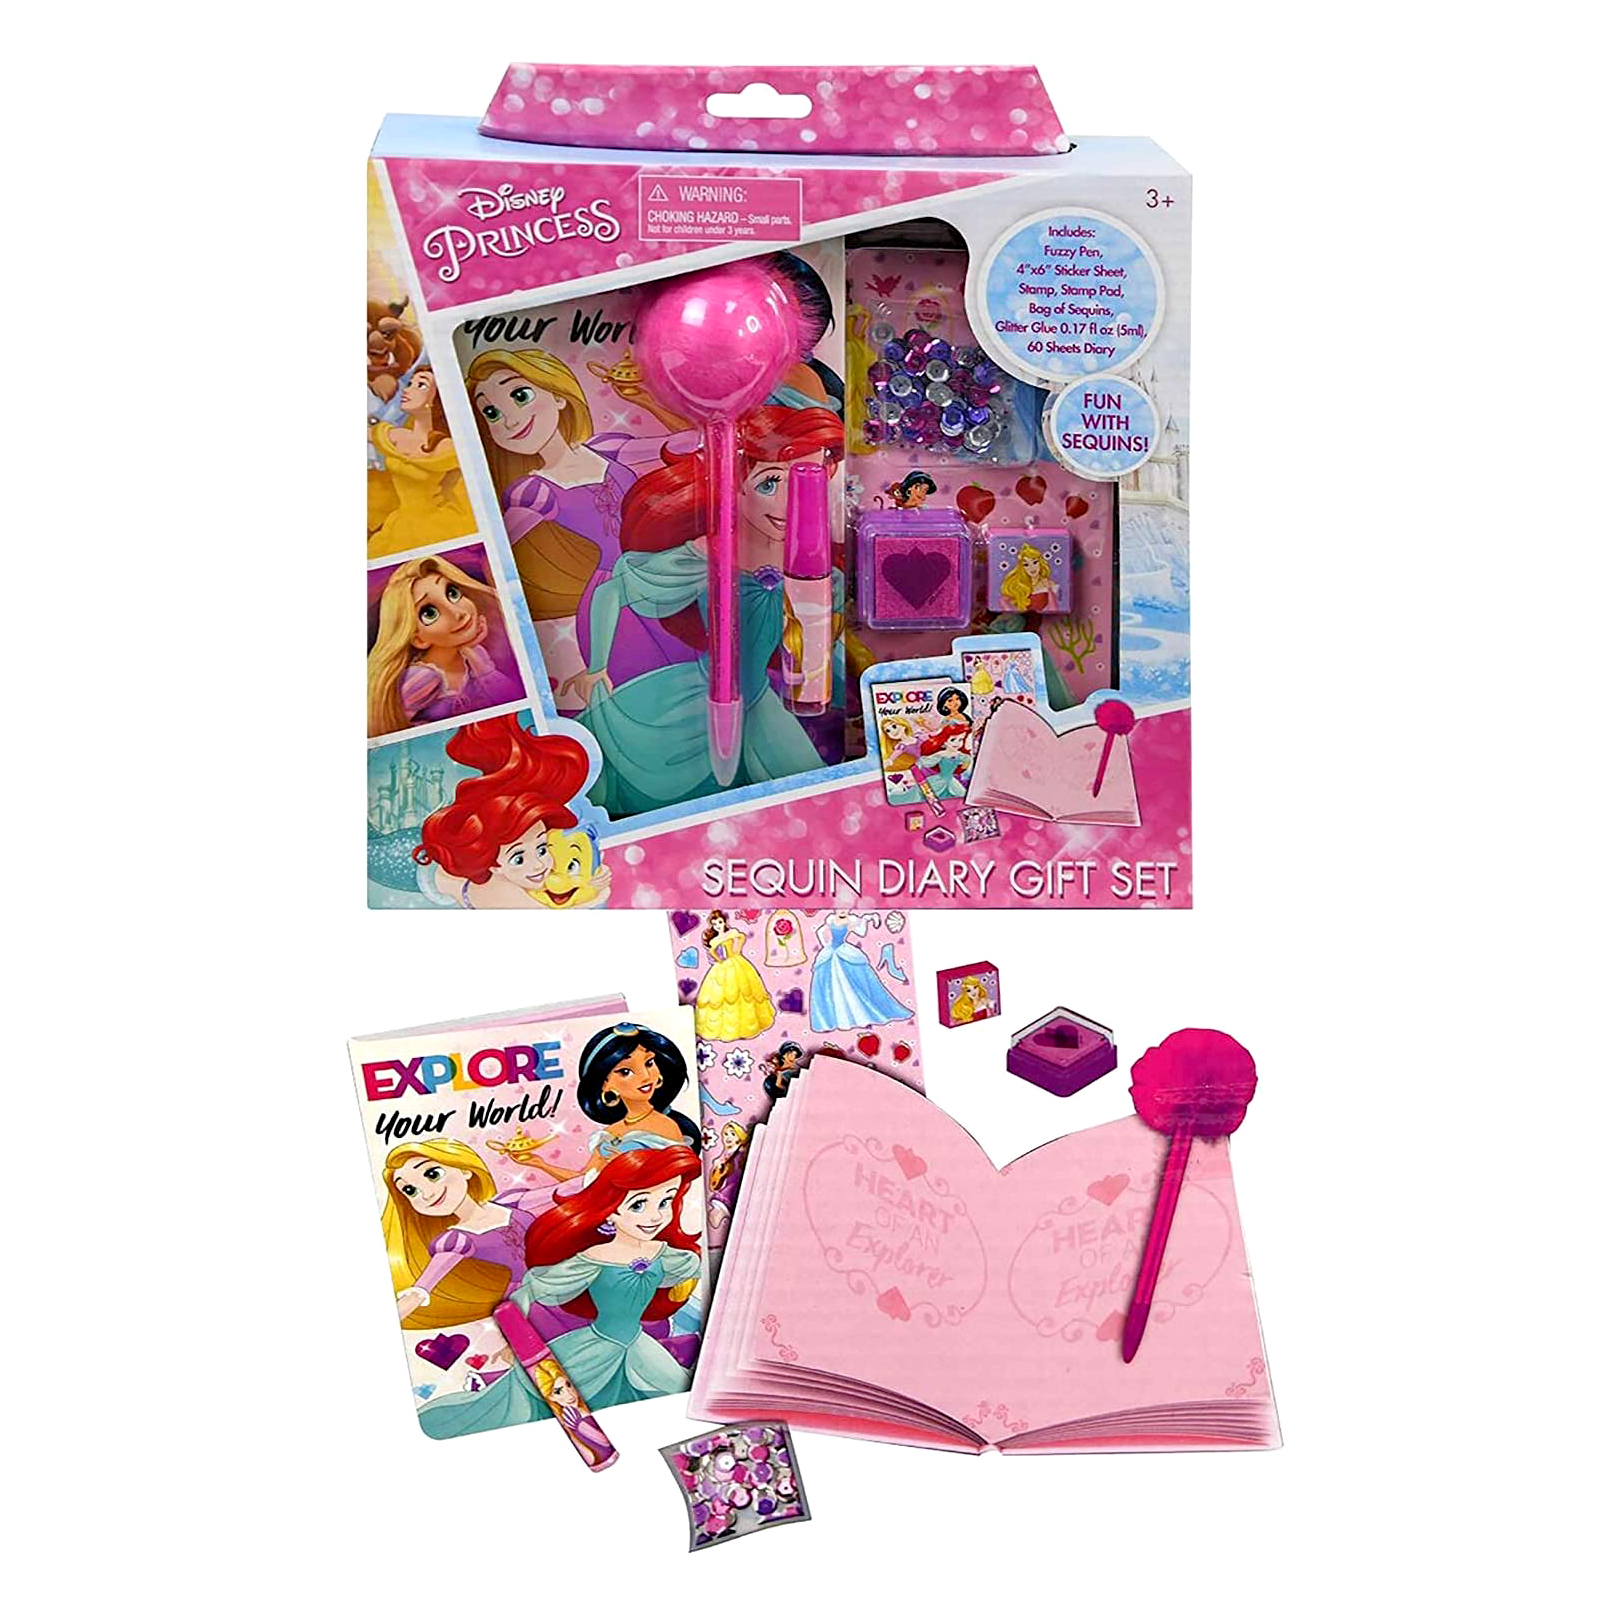 Disney Princess Sequin Diary Gift Set